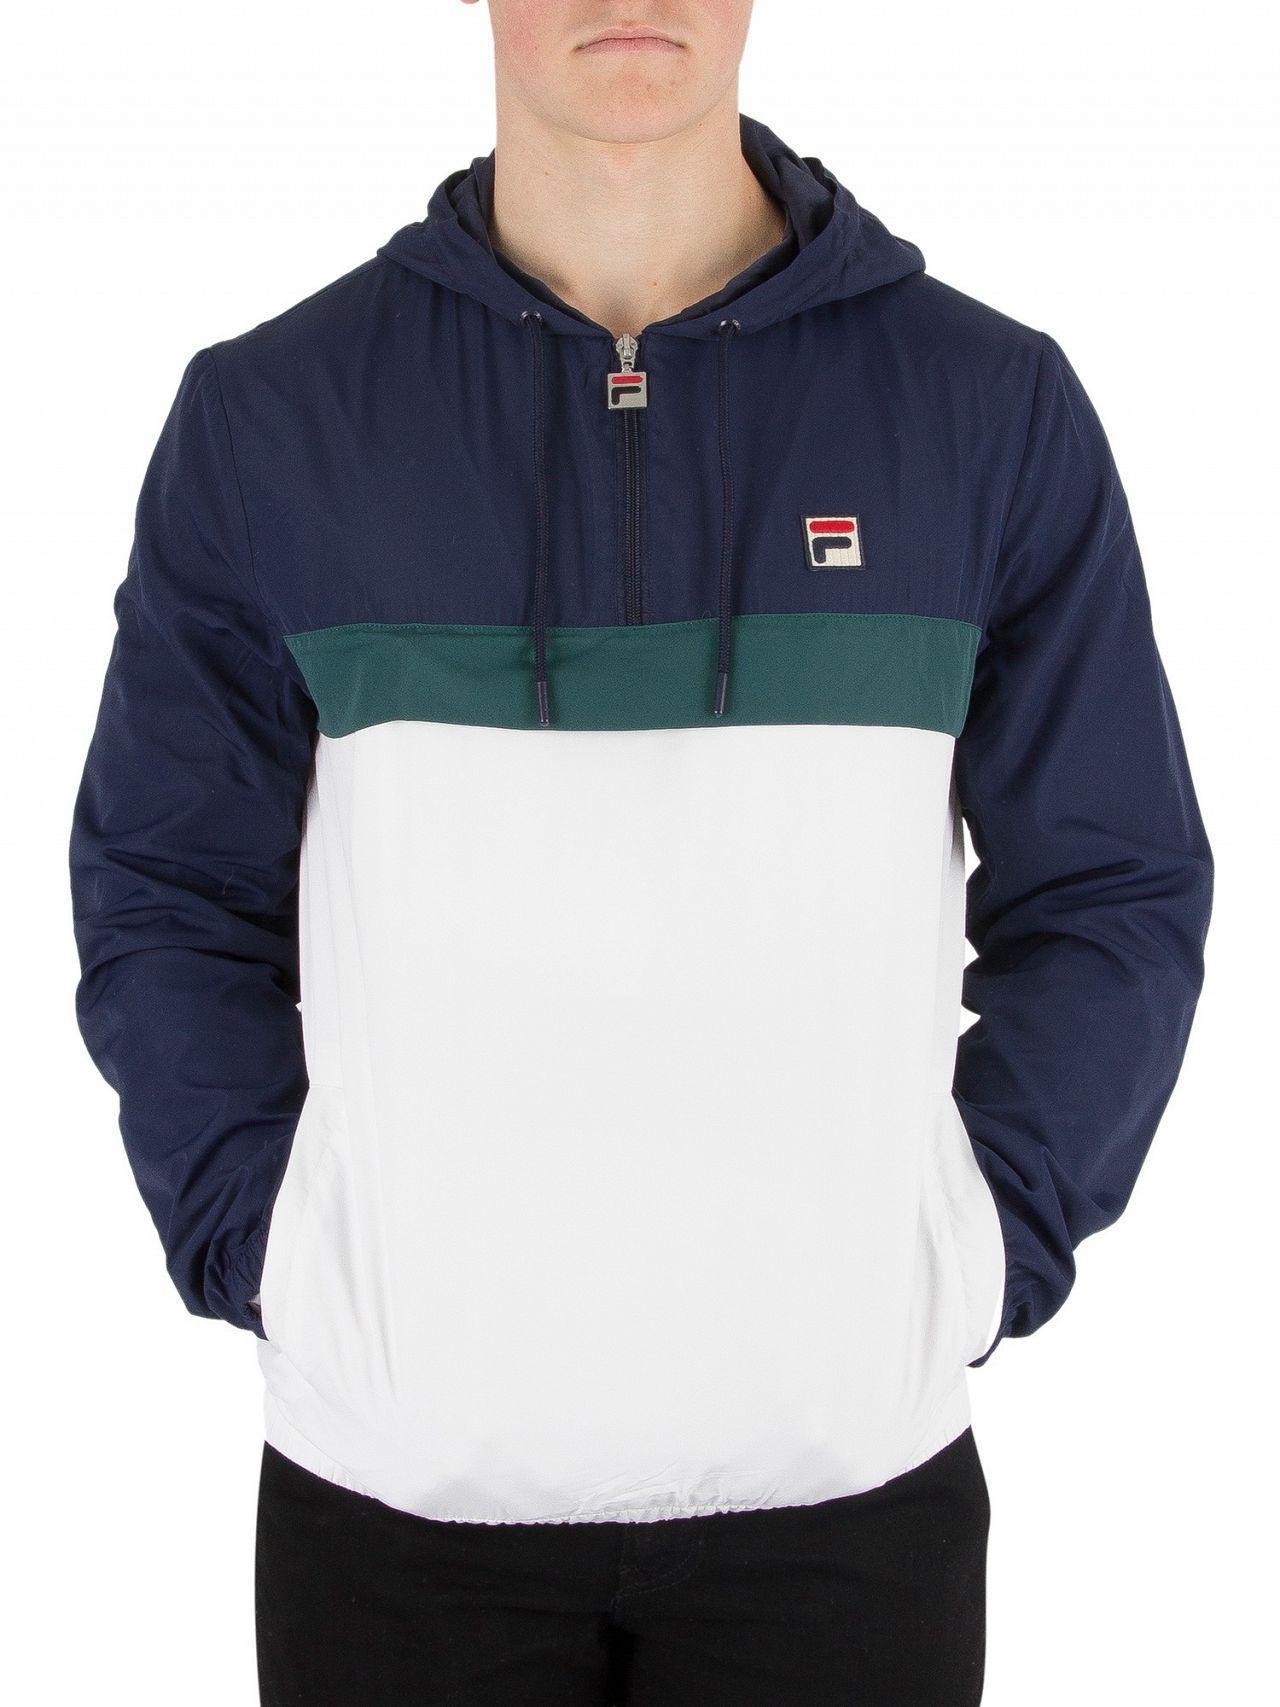 326c9122570b Fila Vintage White, Peacoat, J Bug Cipolla 1/2 Zip Pullover Jacket ...